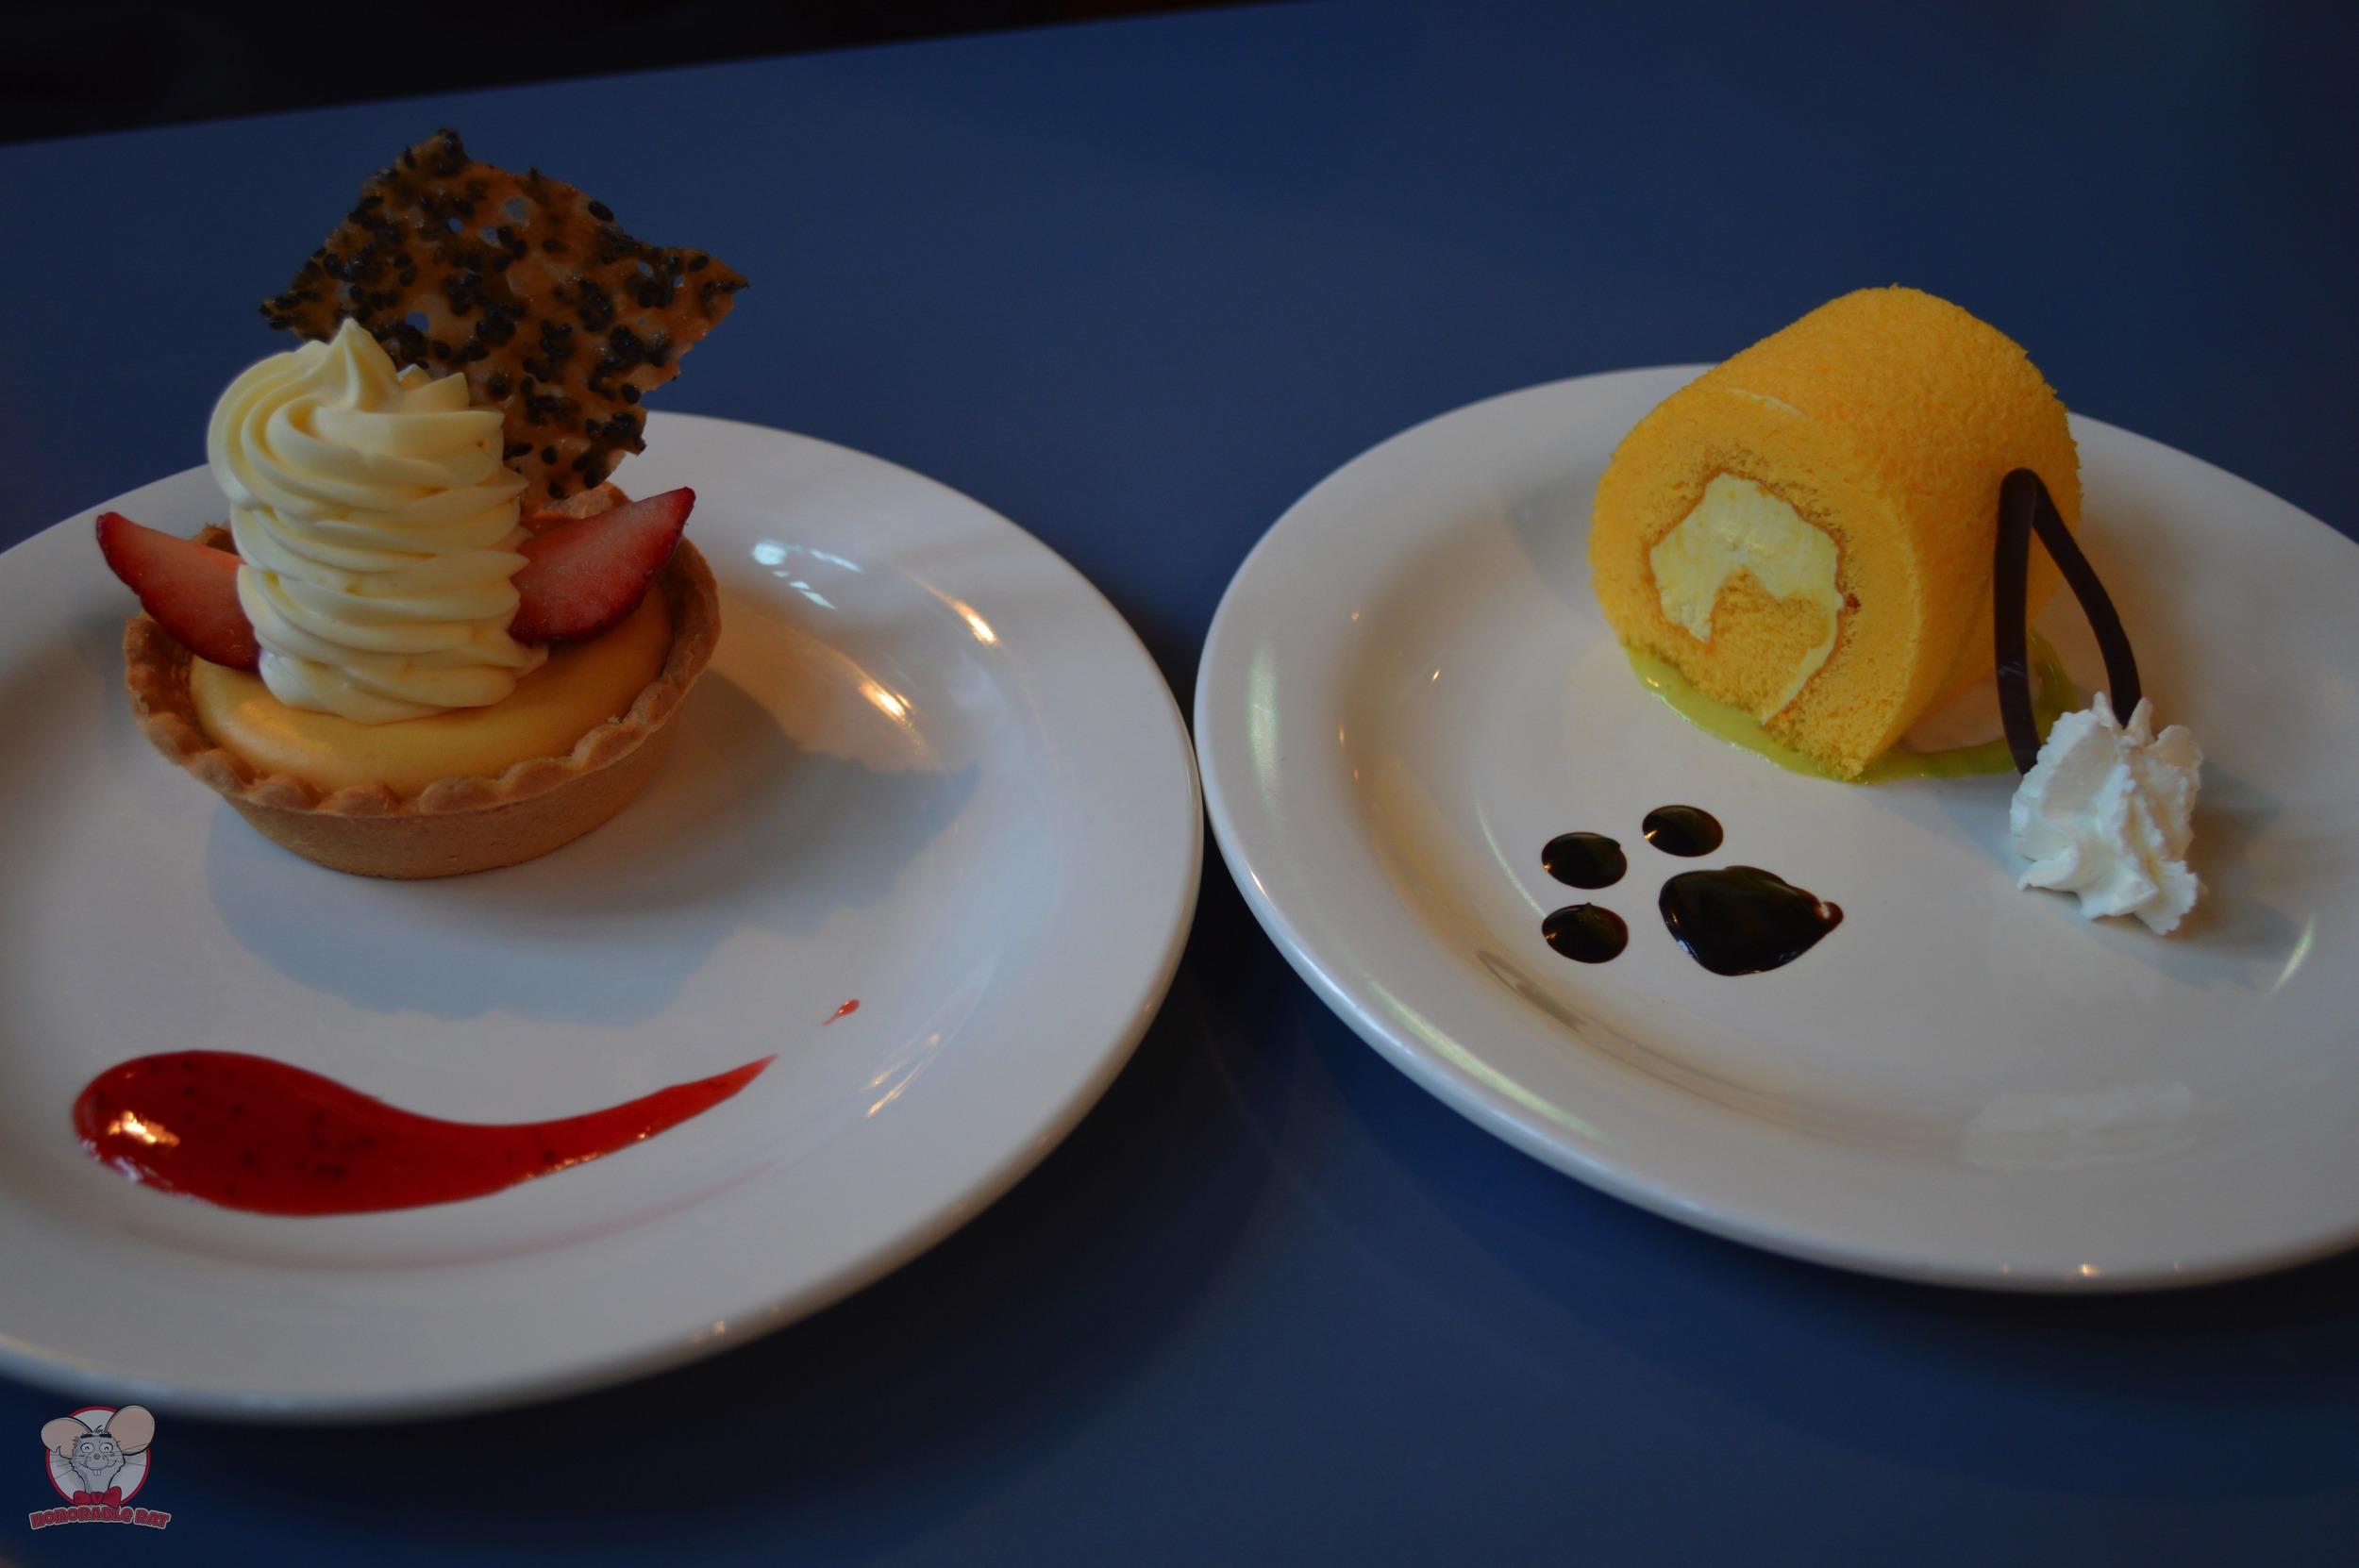 Double Cheese Tart (Left), Banana Cream Roll Cake (Right)